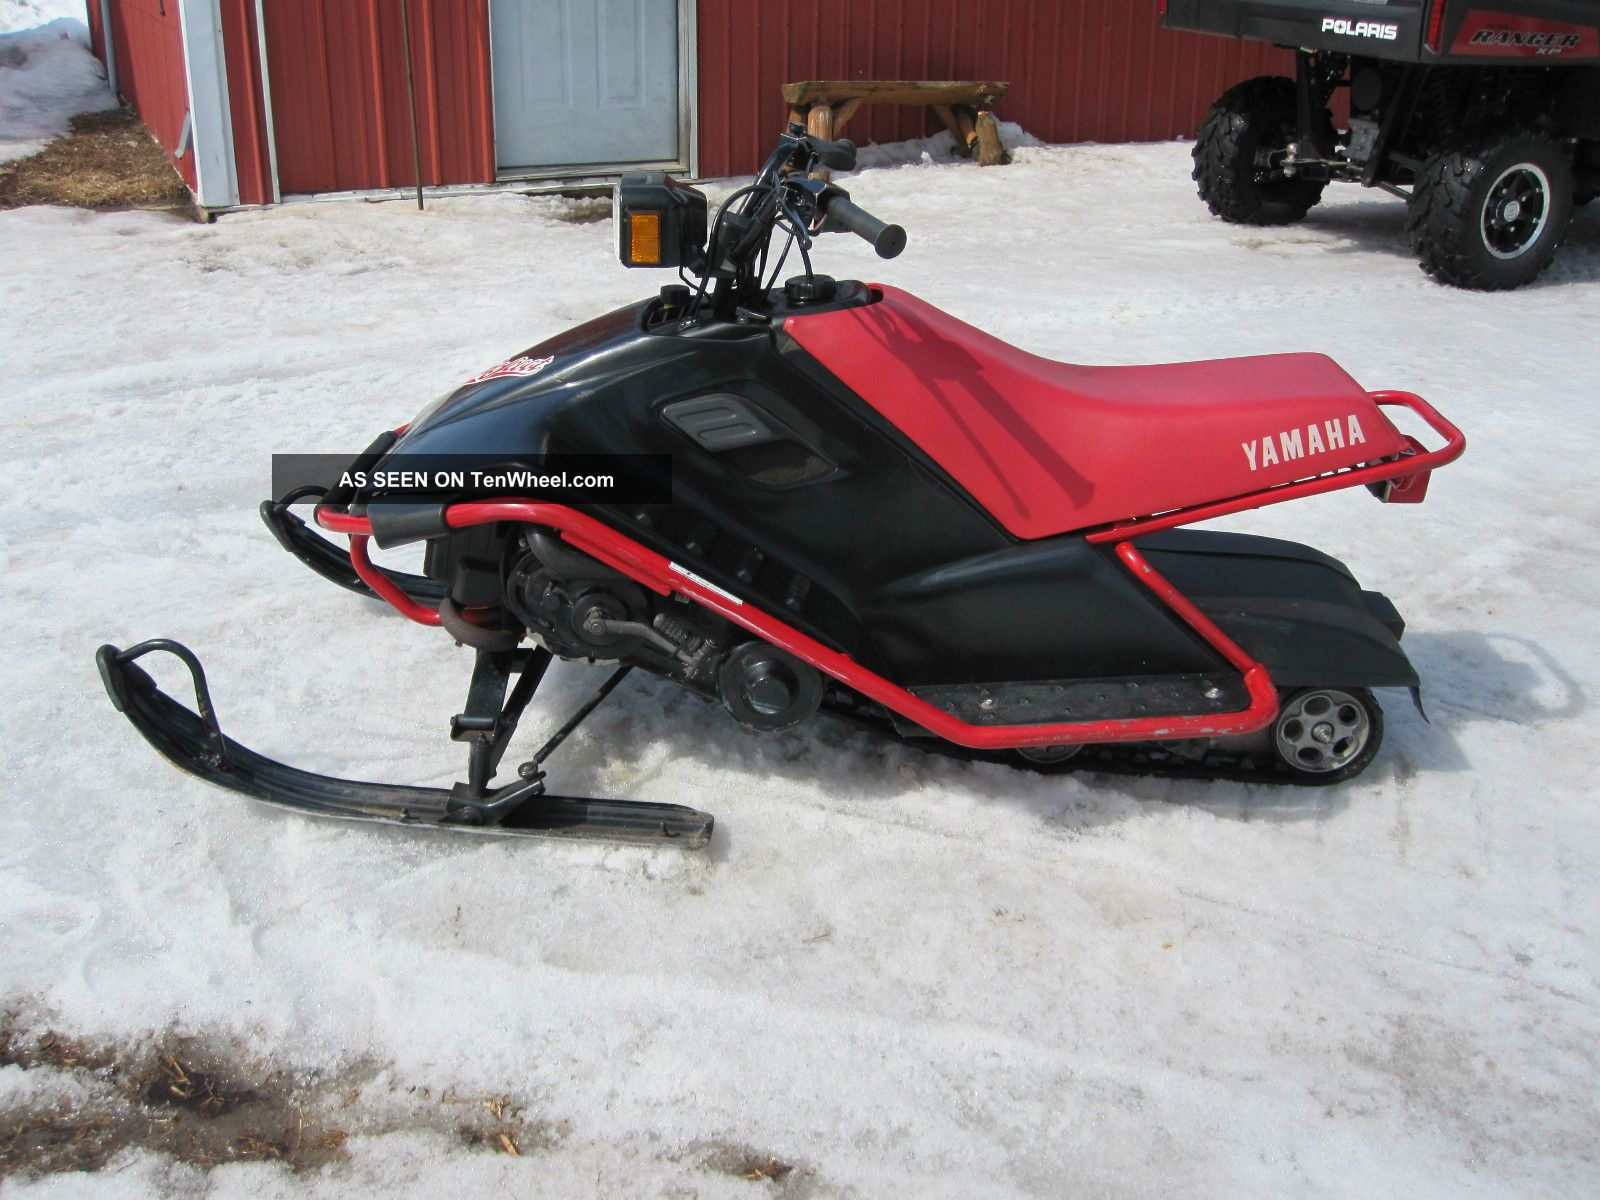 Yamaha Sno Scoot Specs